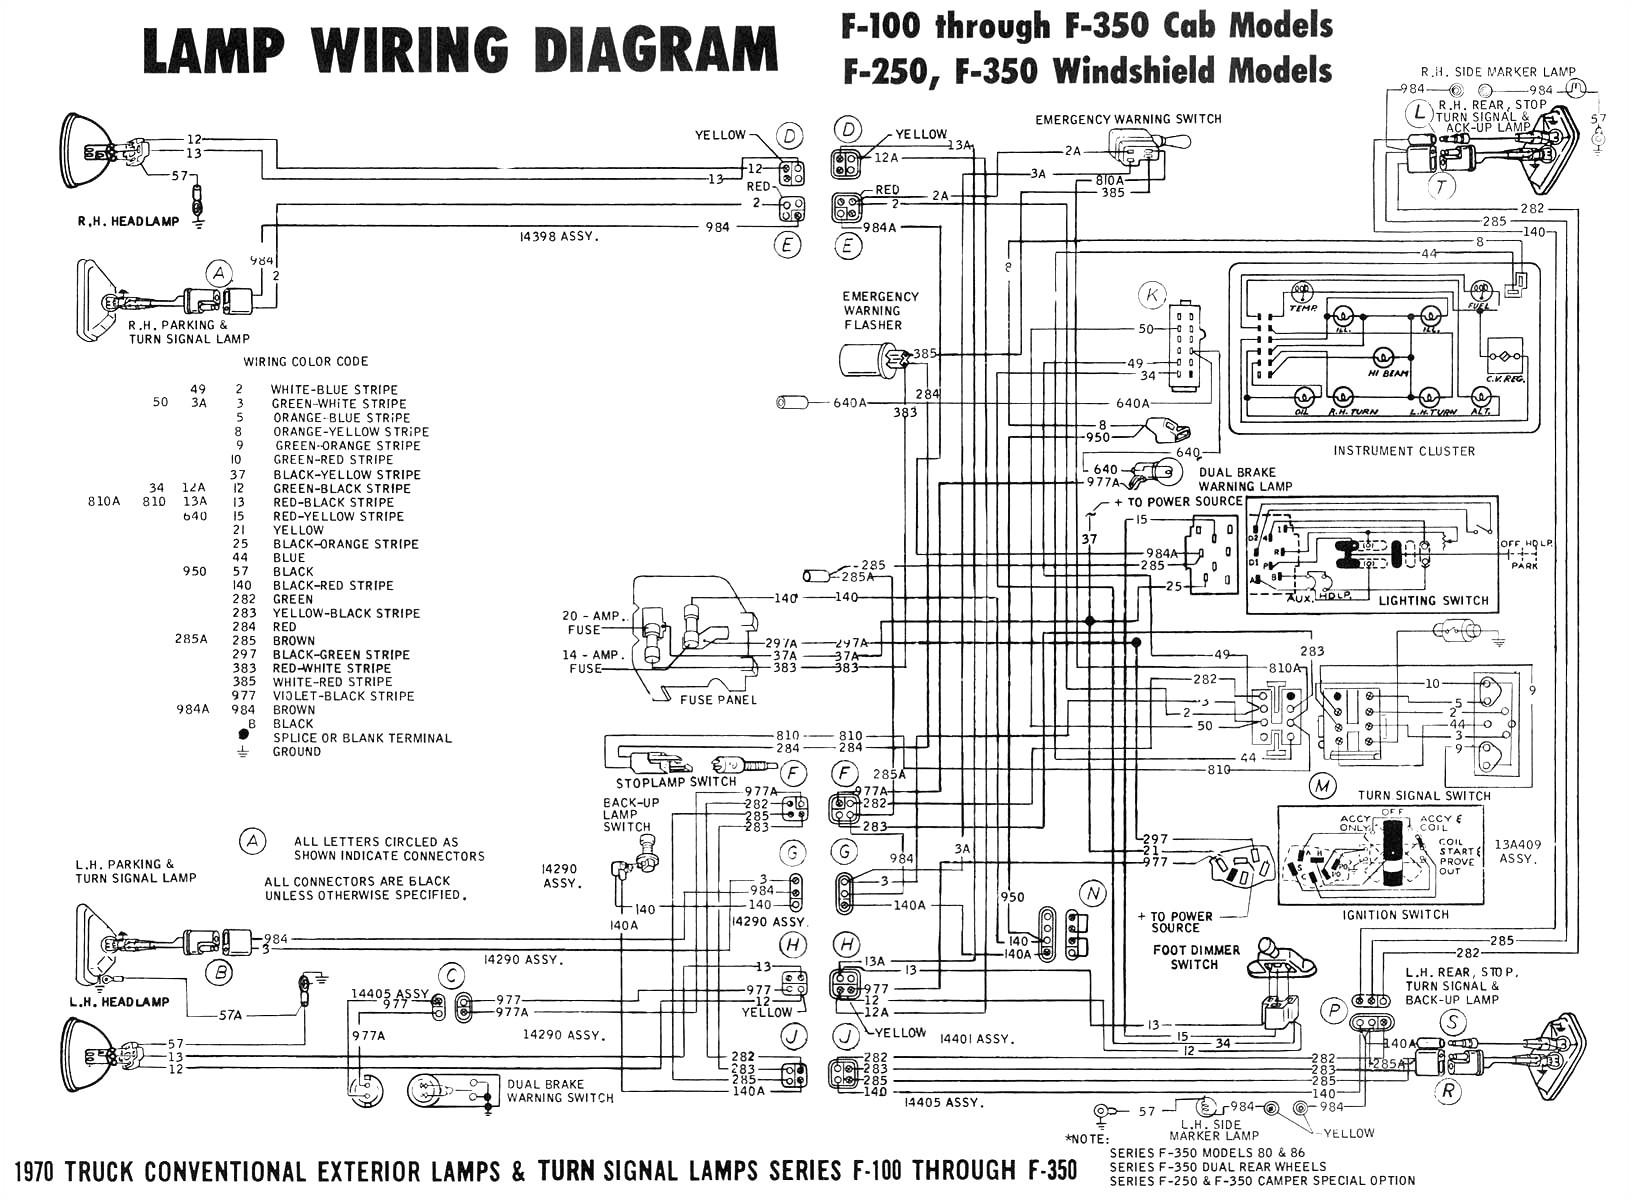 ford f350 wire diagram wiring diagram list 2006 ford f350 wiring diagram free